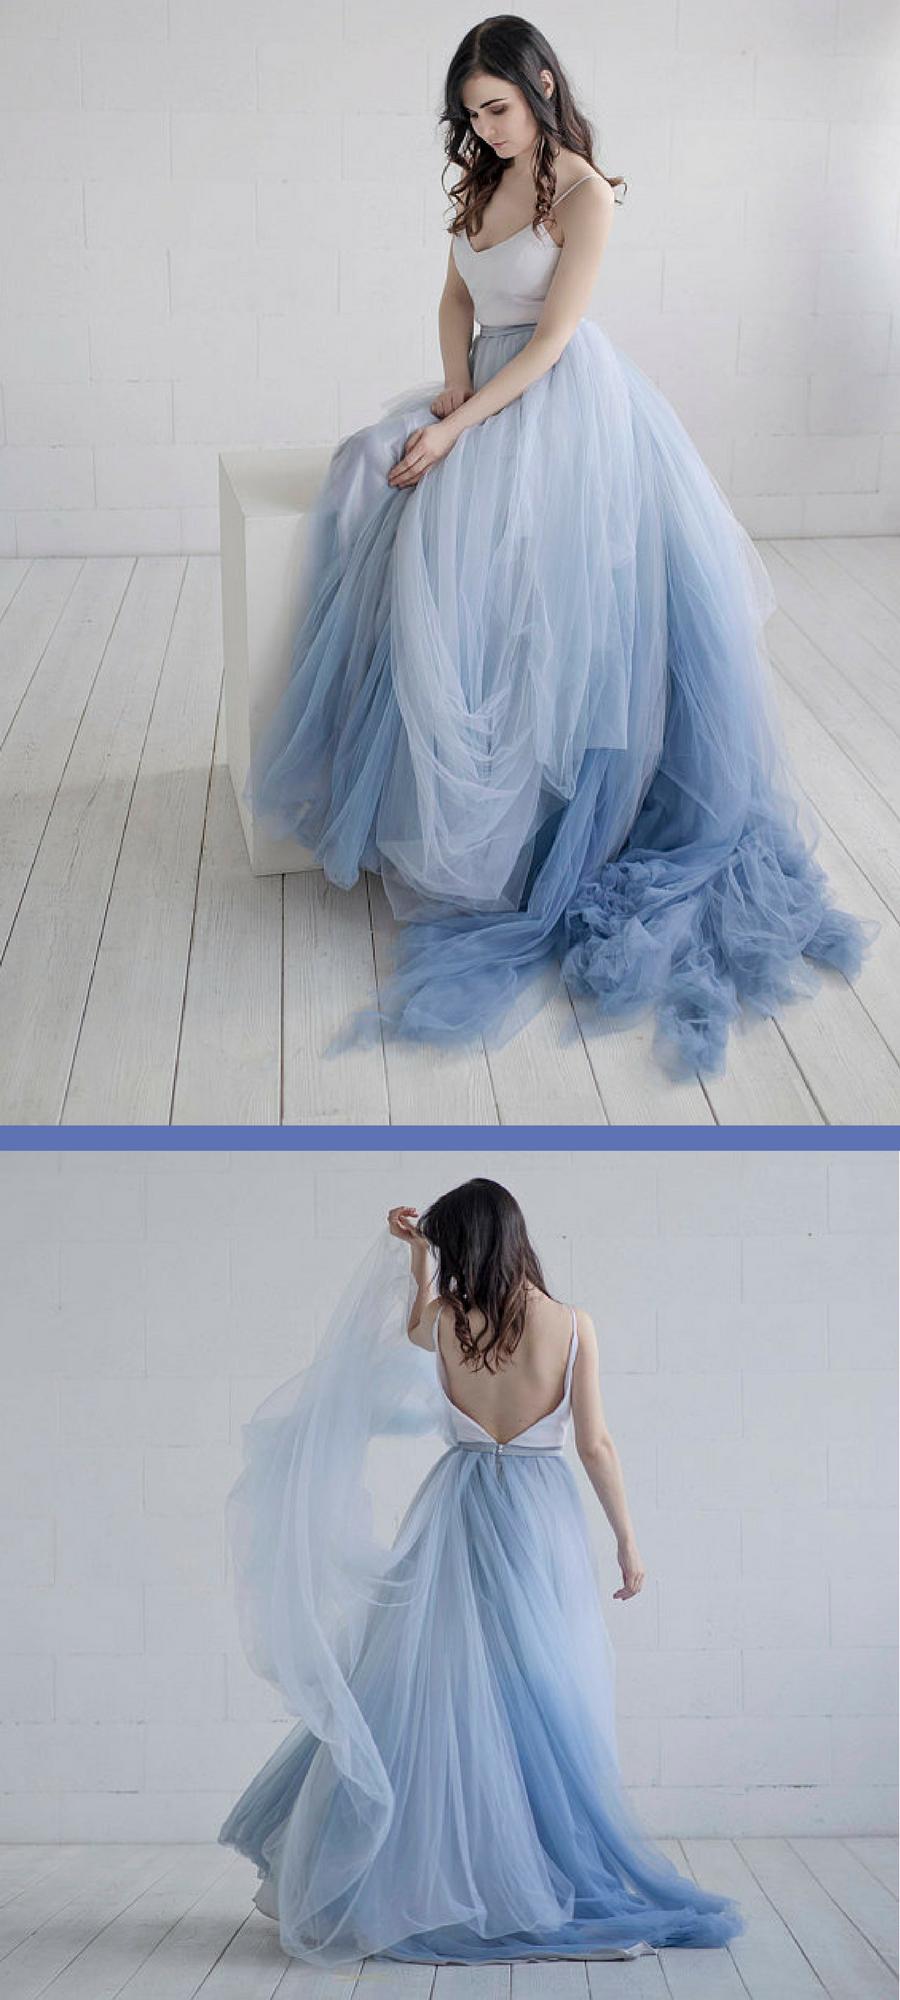 Gorgeous Nora Ombre Wedding Gown Wedding Dress Wedding Ideas Bridal Dress Bride Ad Two Piece Wedding Dress Blue Wedding Dresses Tulle Wedding Dress [ 2000 x 900 Pixel ]